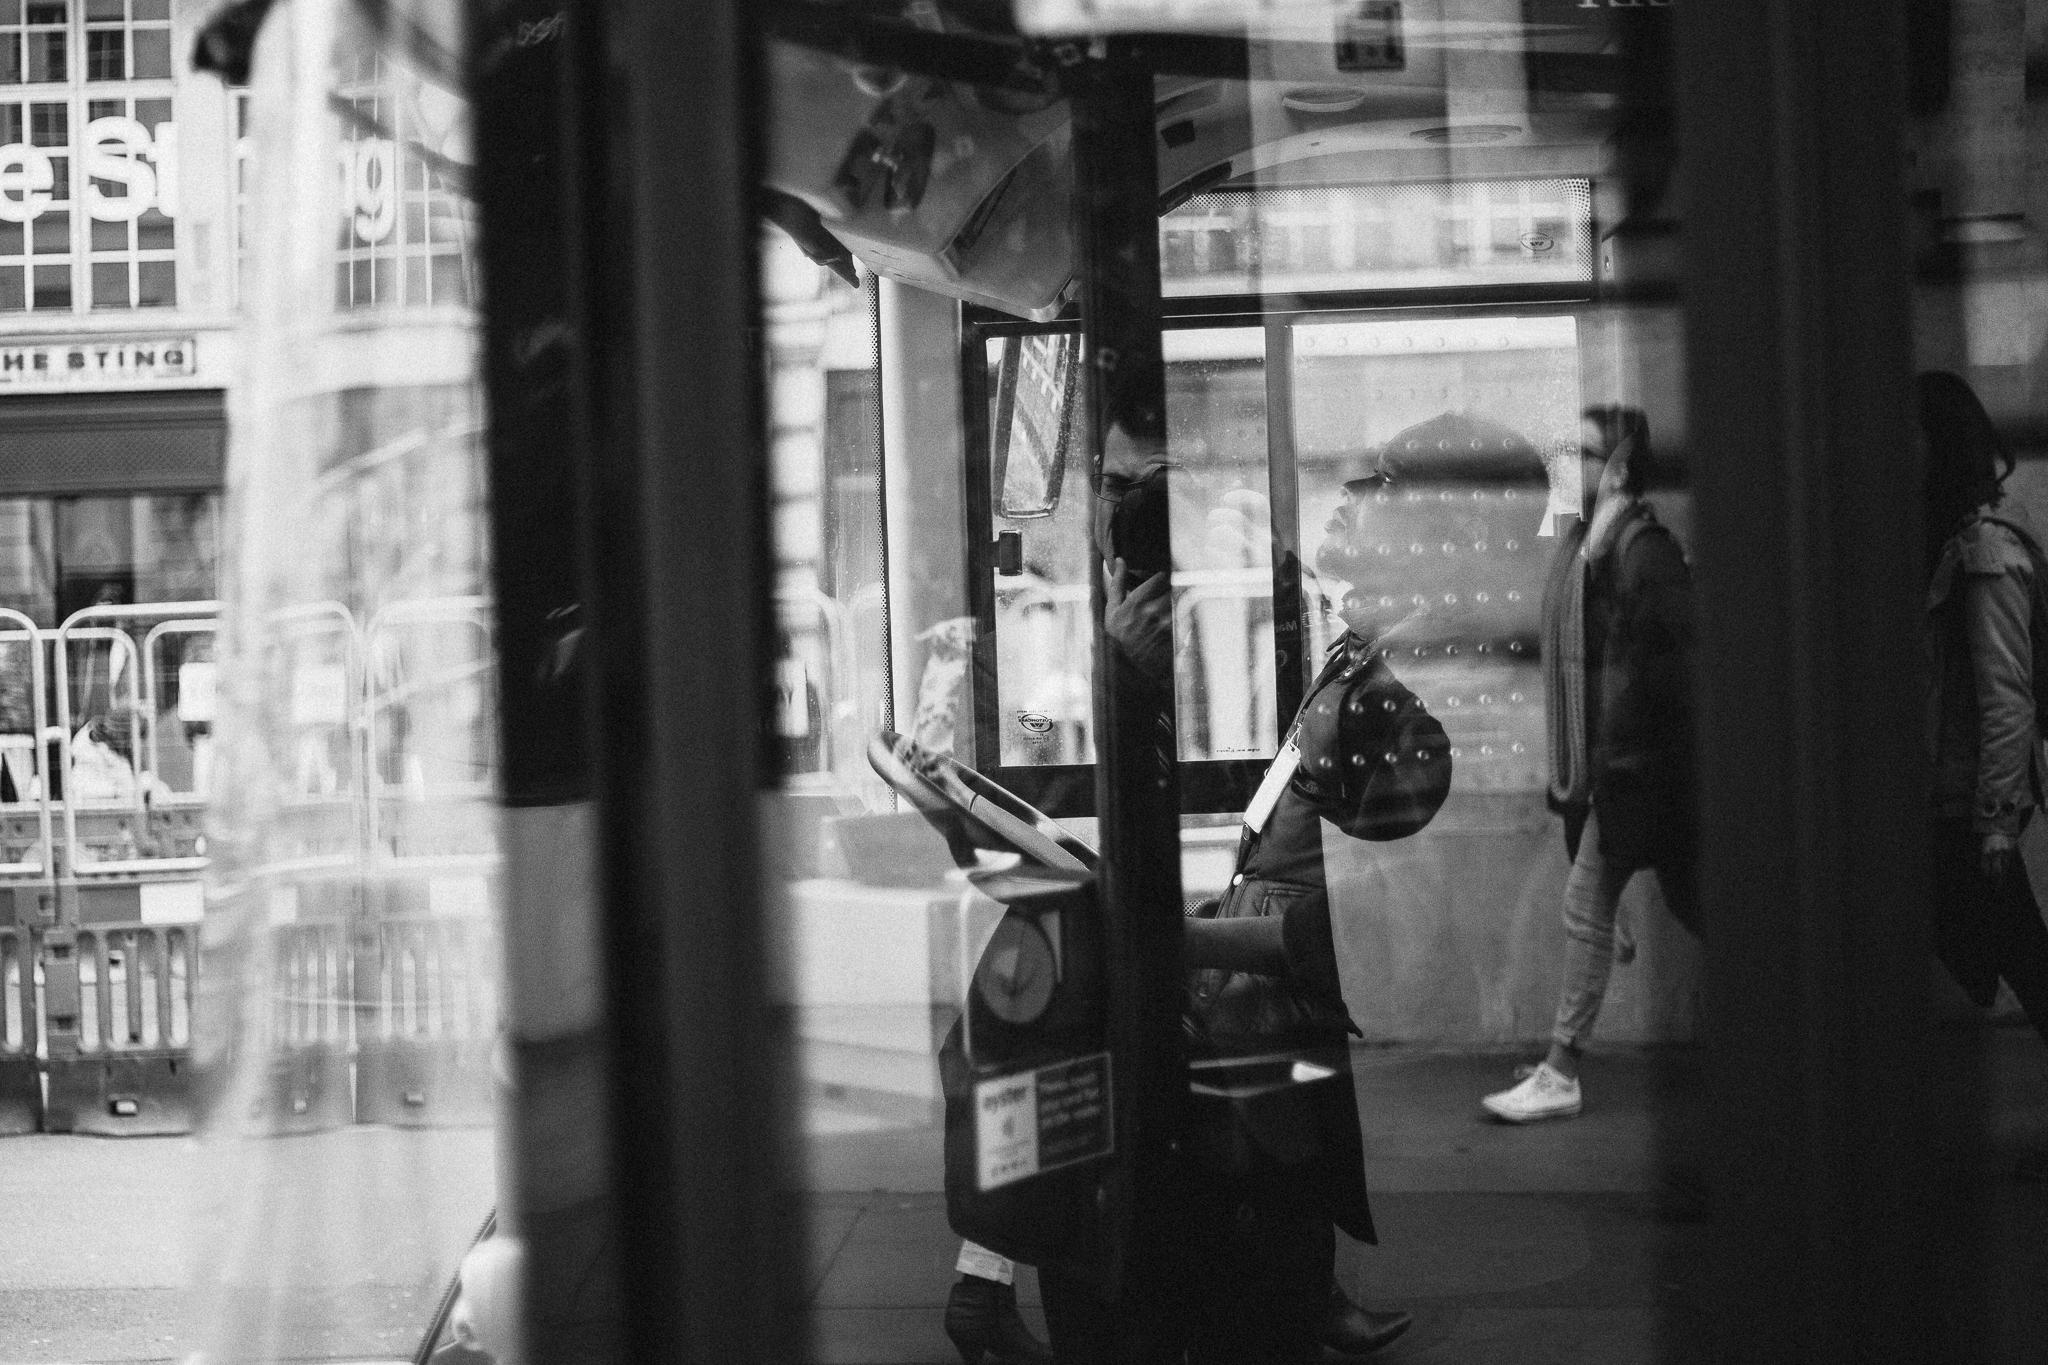 StreetsOfLondon_0017.jpg